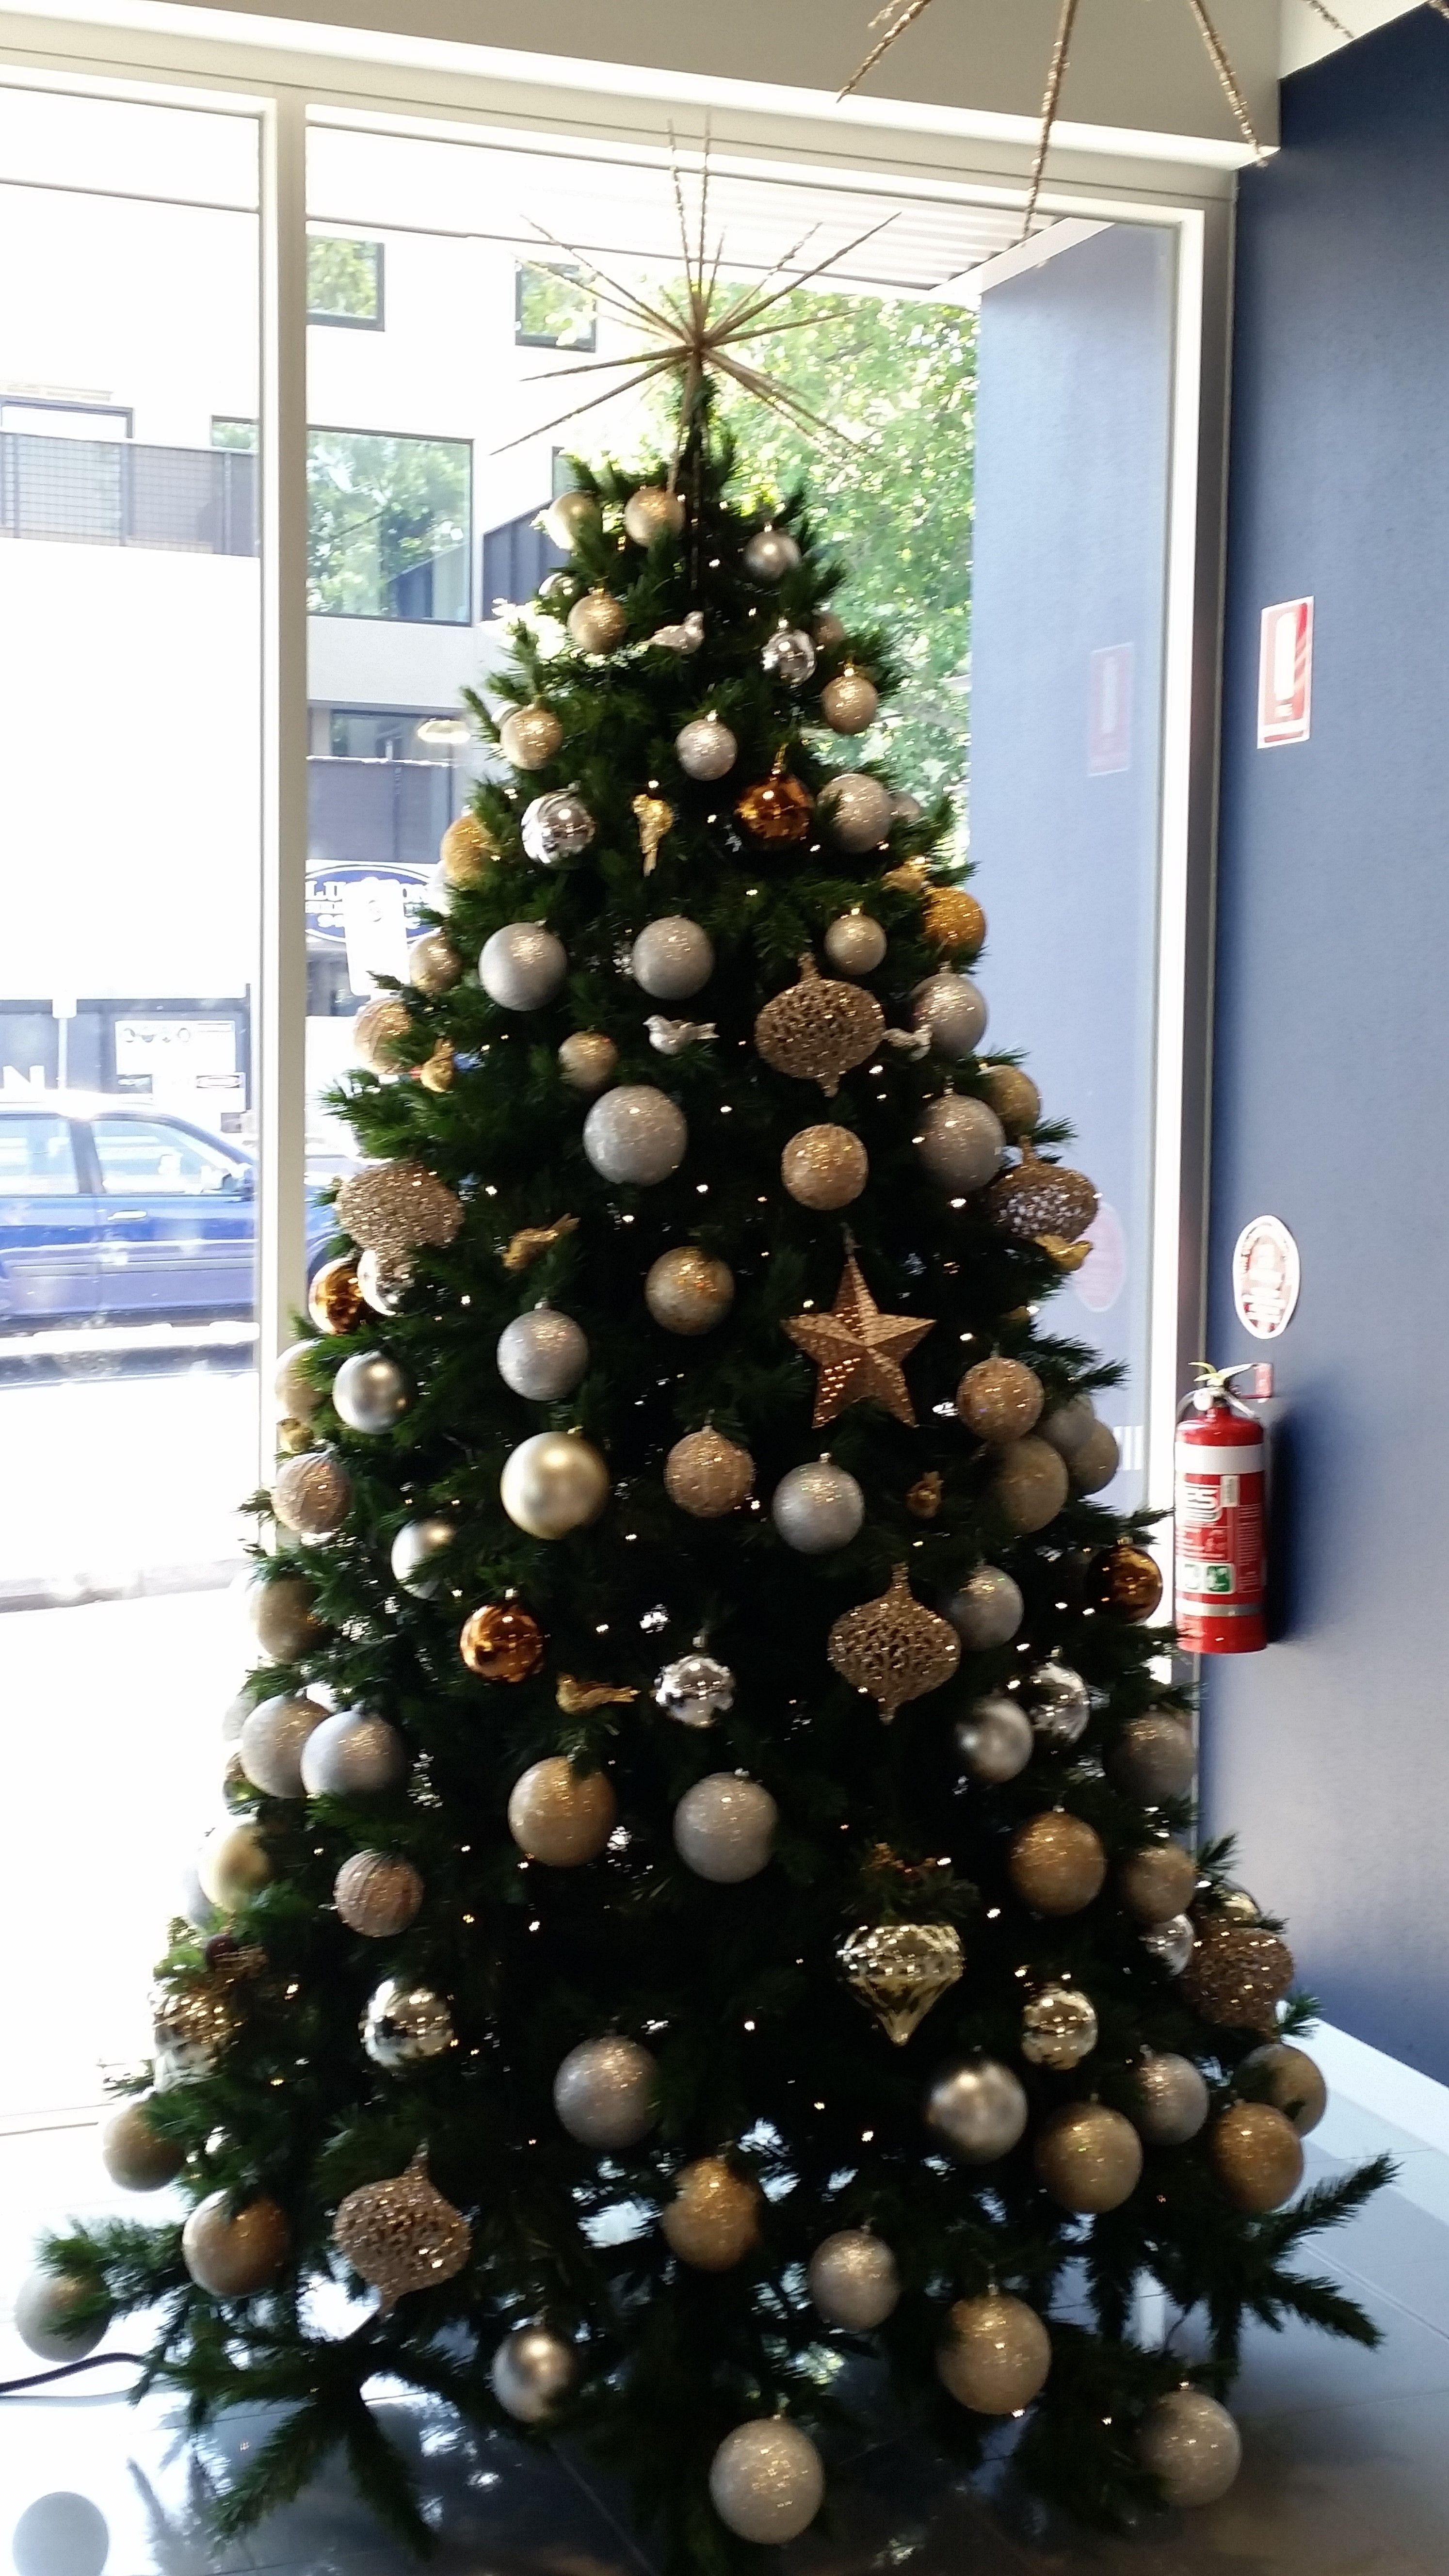 The Happy Christmas Company Decorated Christmas Tree With Metallic Decoratio Christmas Tree Decorations Gold Christmas Tree Decorations Modern Christmas Tree